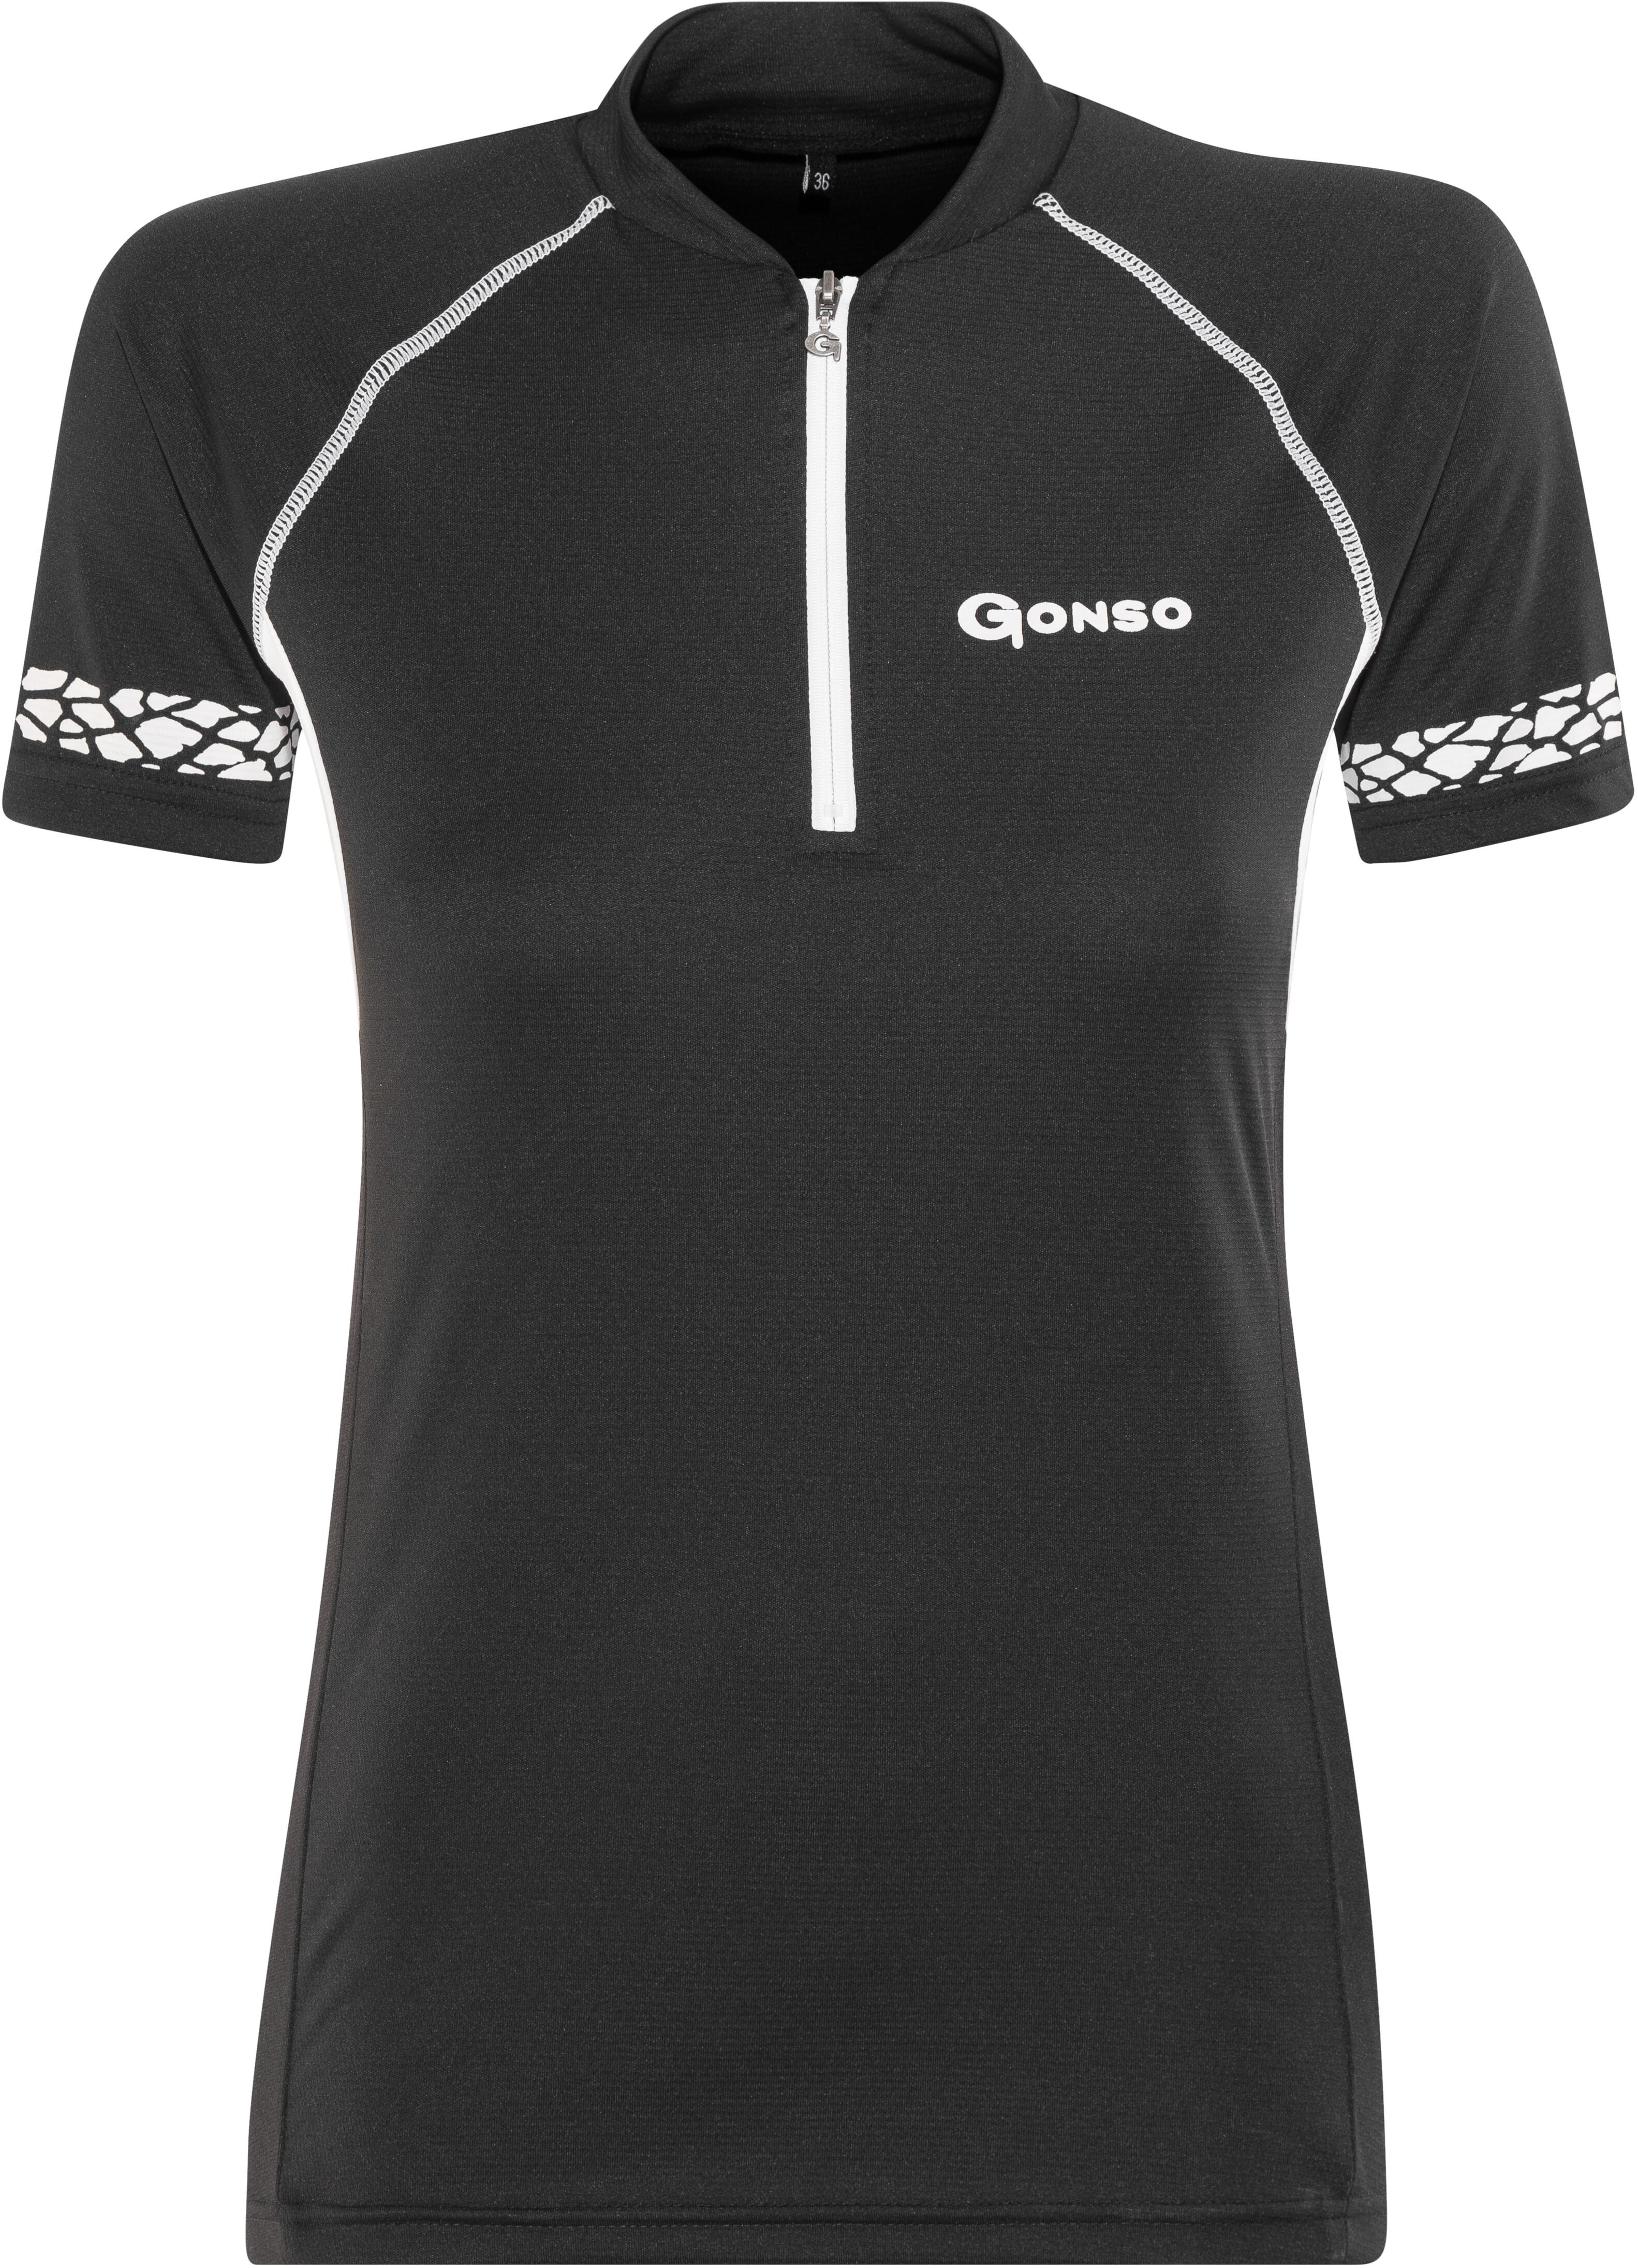 Gonso Pona Bike Jersey Shortsleeve Women black at Bikester.co.uk 8c8a6e84c